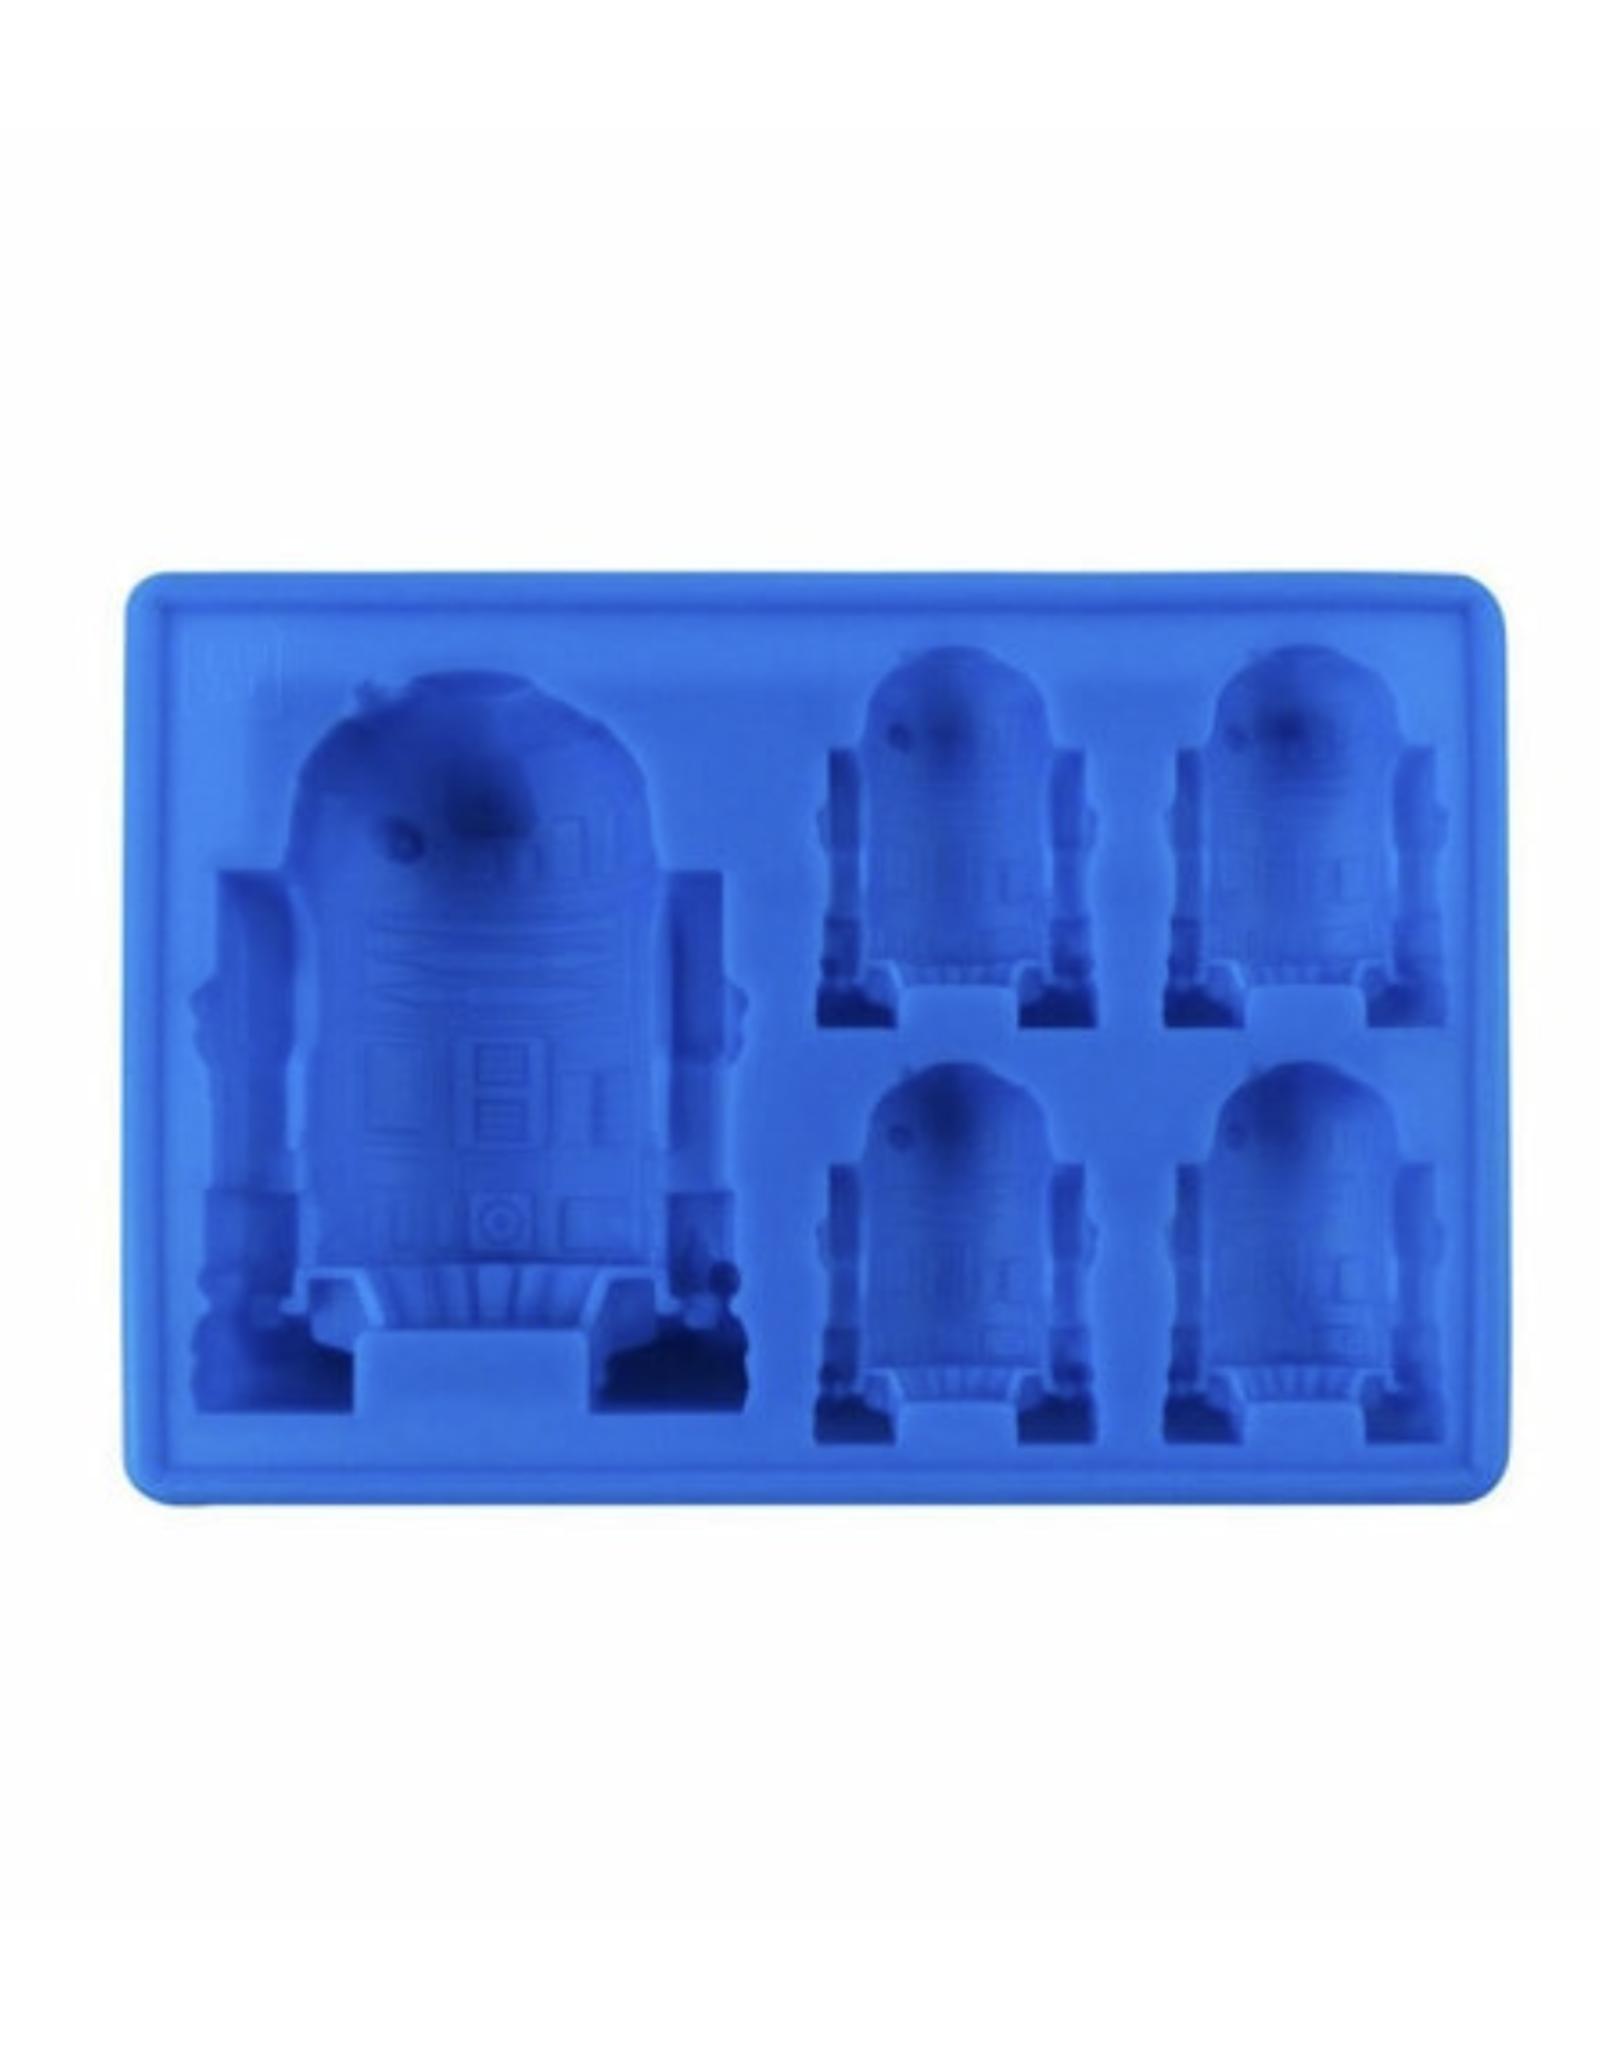 Dope Molds - 5 Cavity R2D2